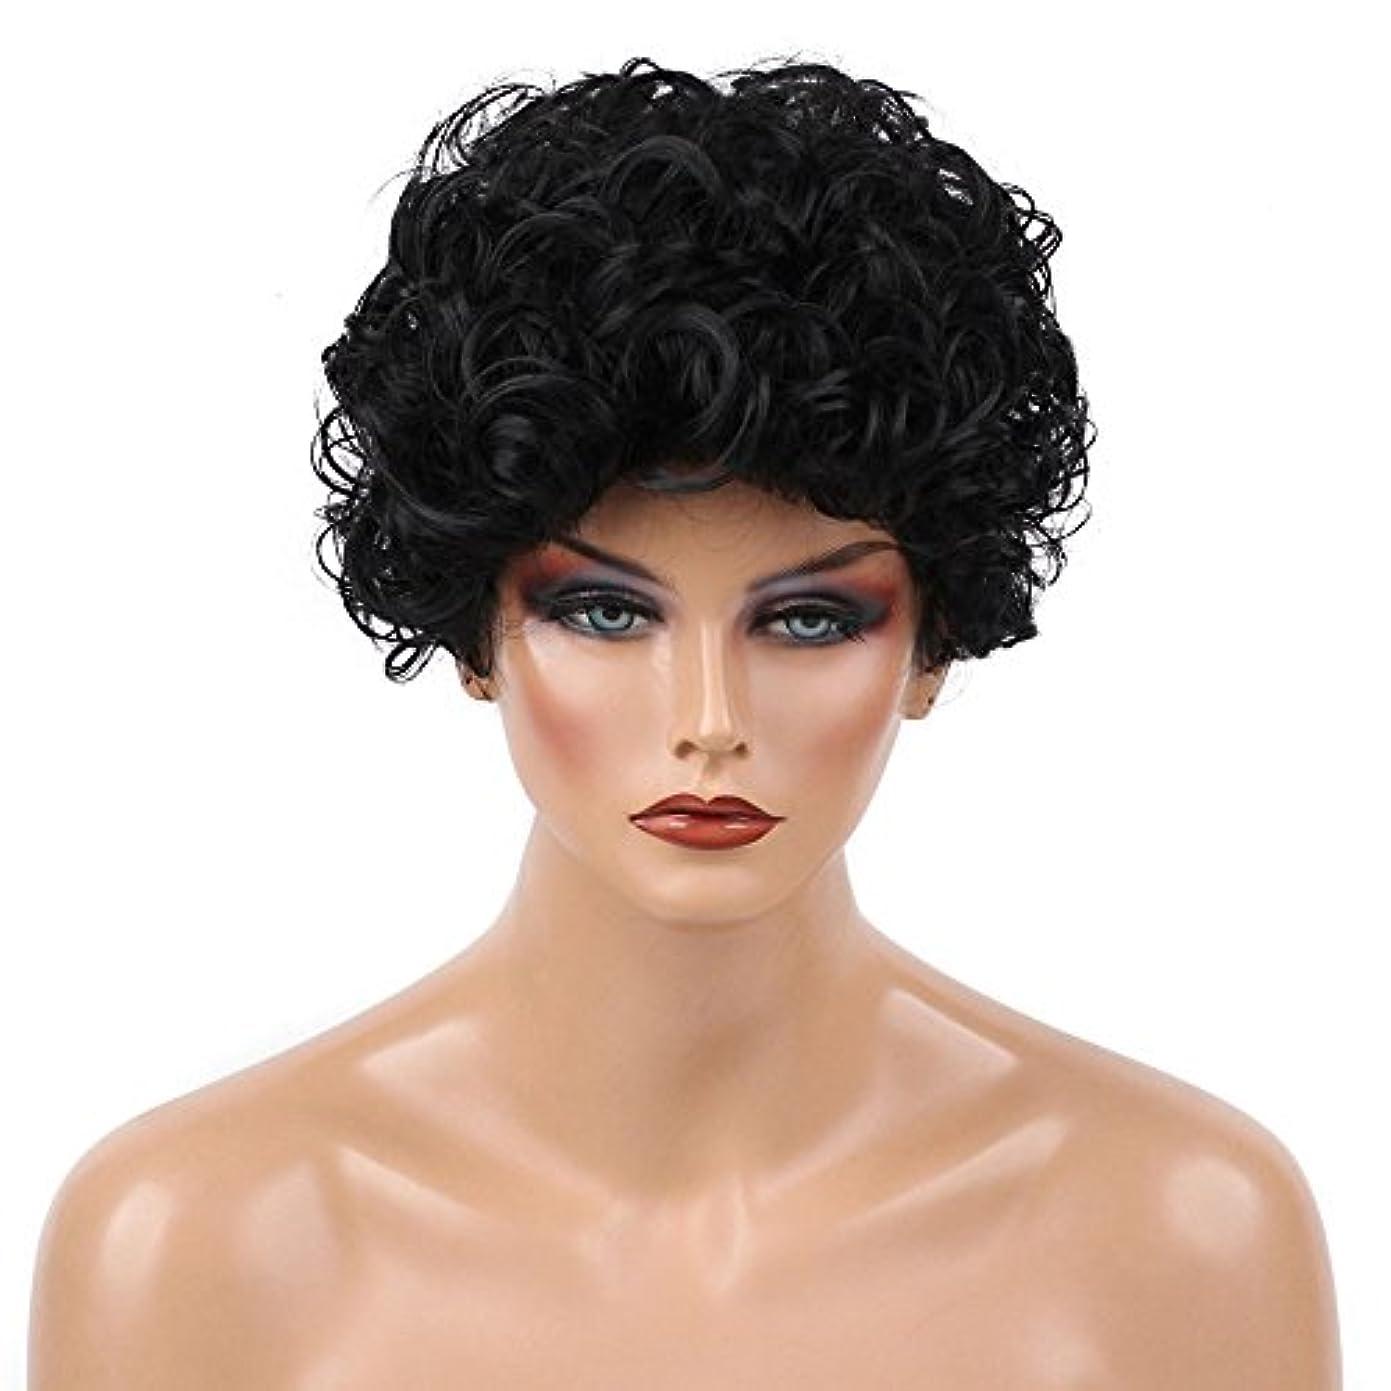 Suppion、ヨーロッパと米国ウィッグメスブラックファッションショートヘアAfricanヘアウィッグセット